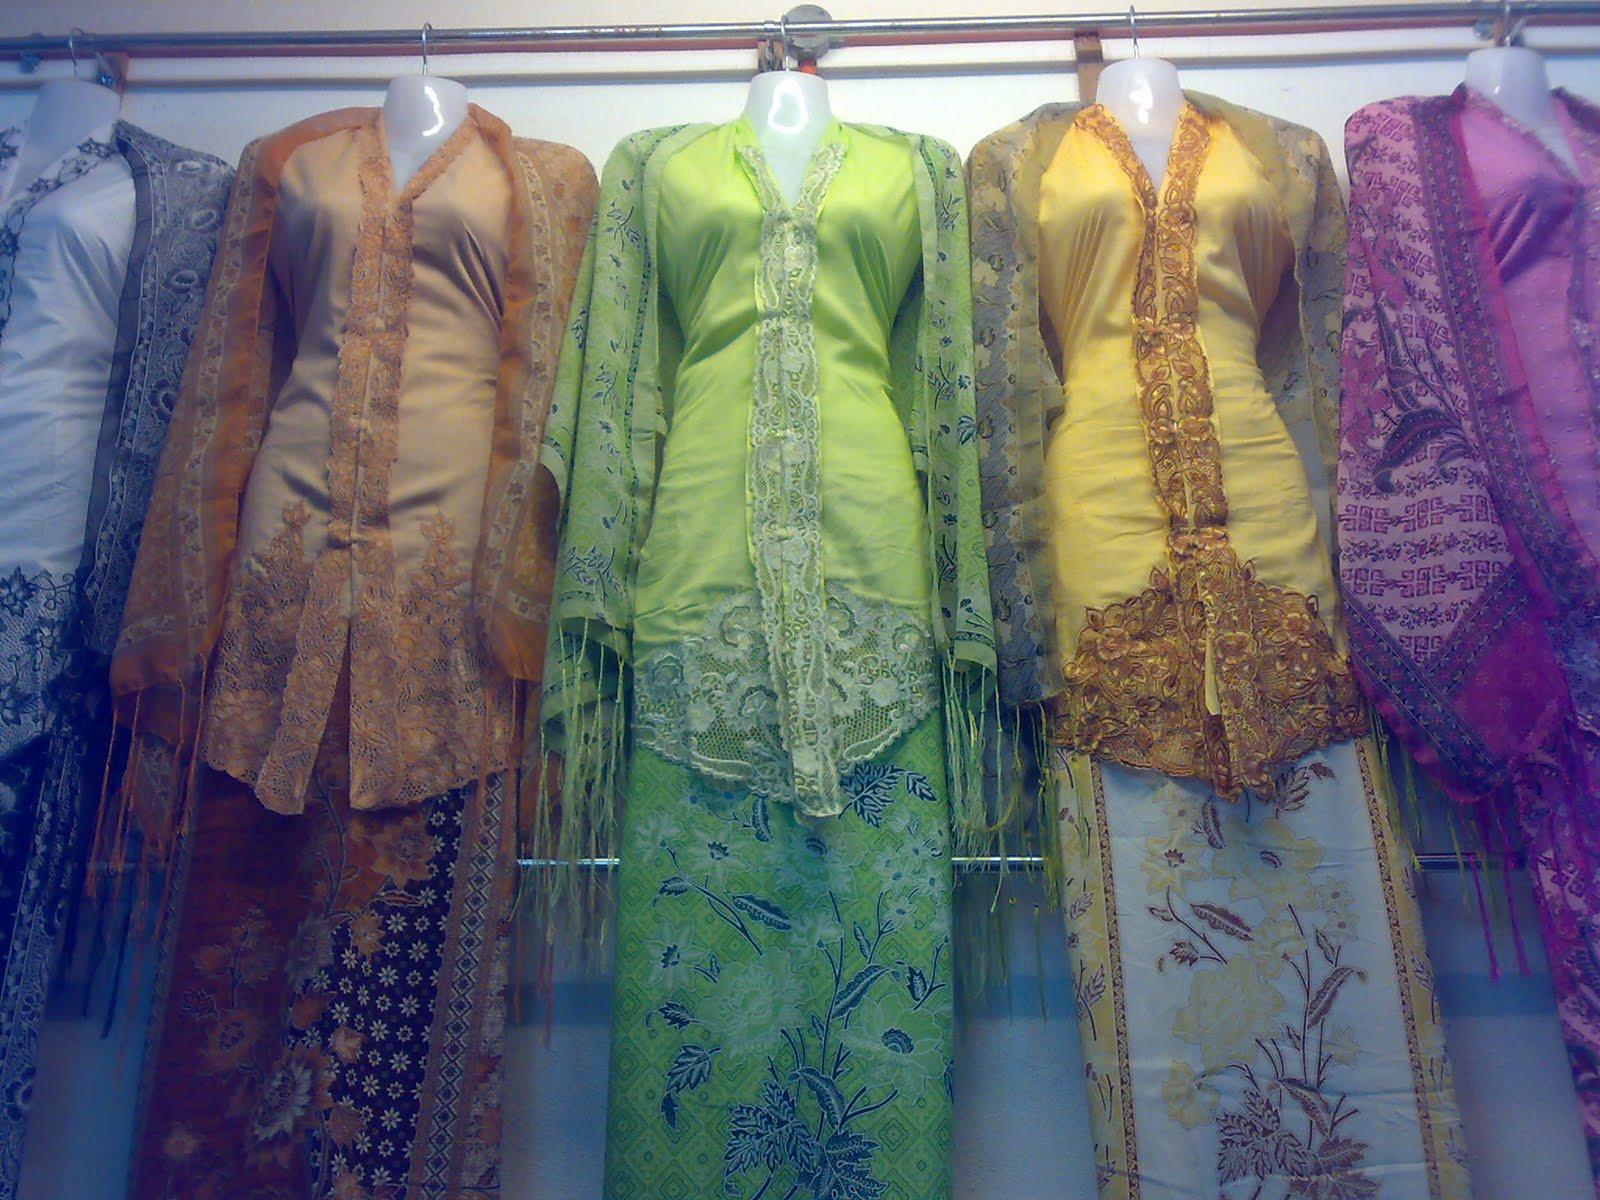 Baju kanak2 branded & kain dari indonesia offer